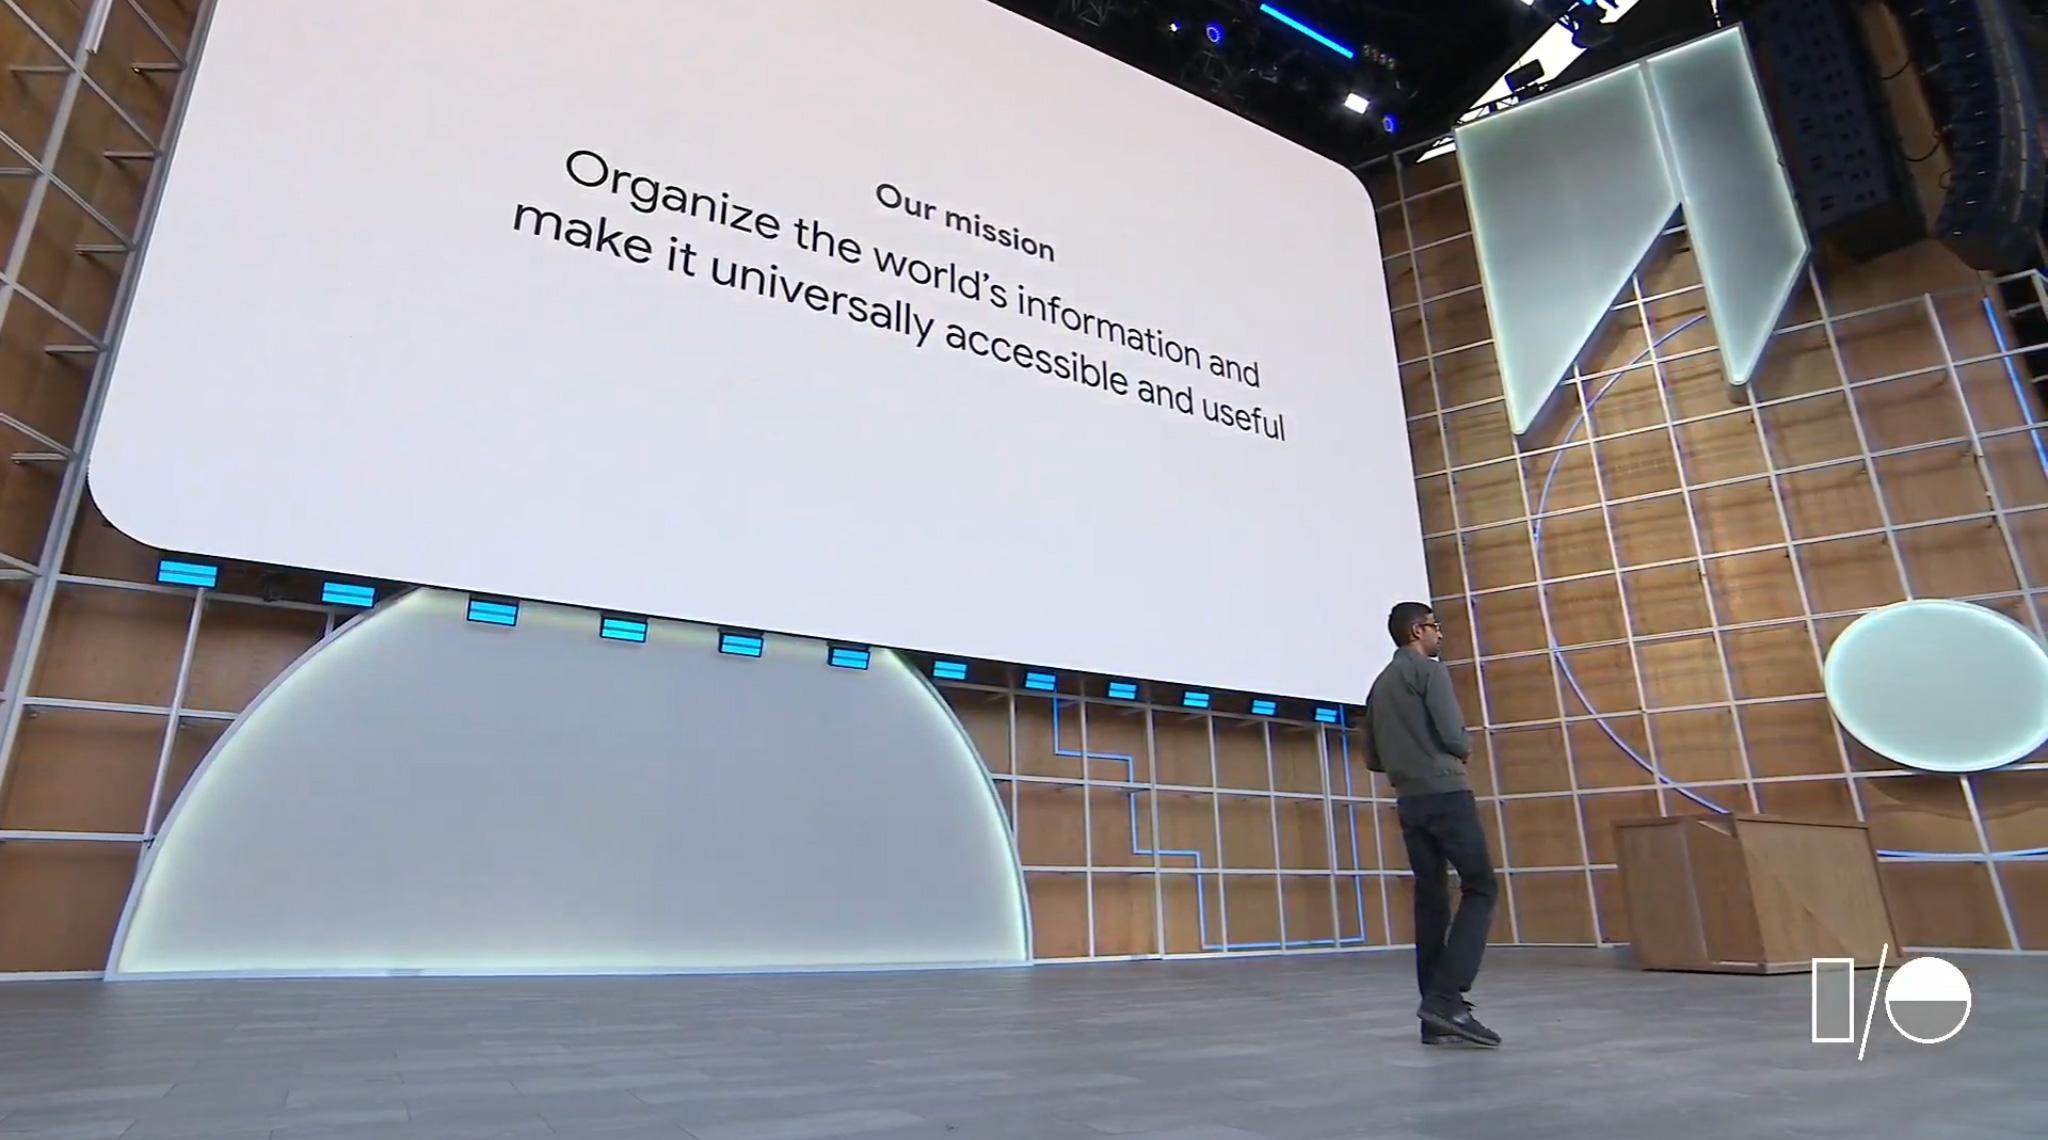 Google I/O Sundar pichai mission